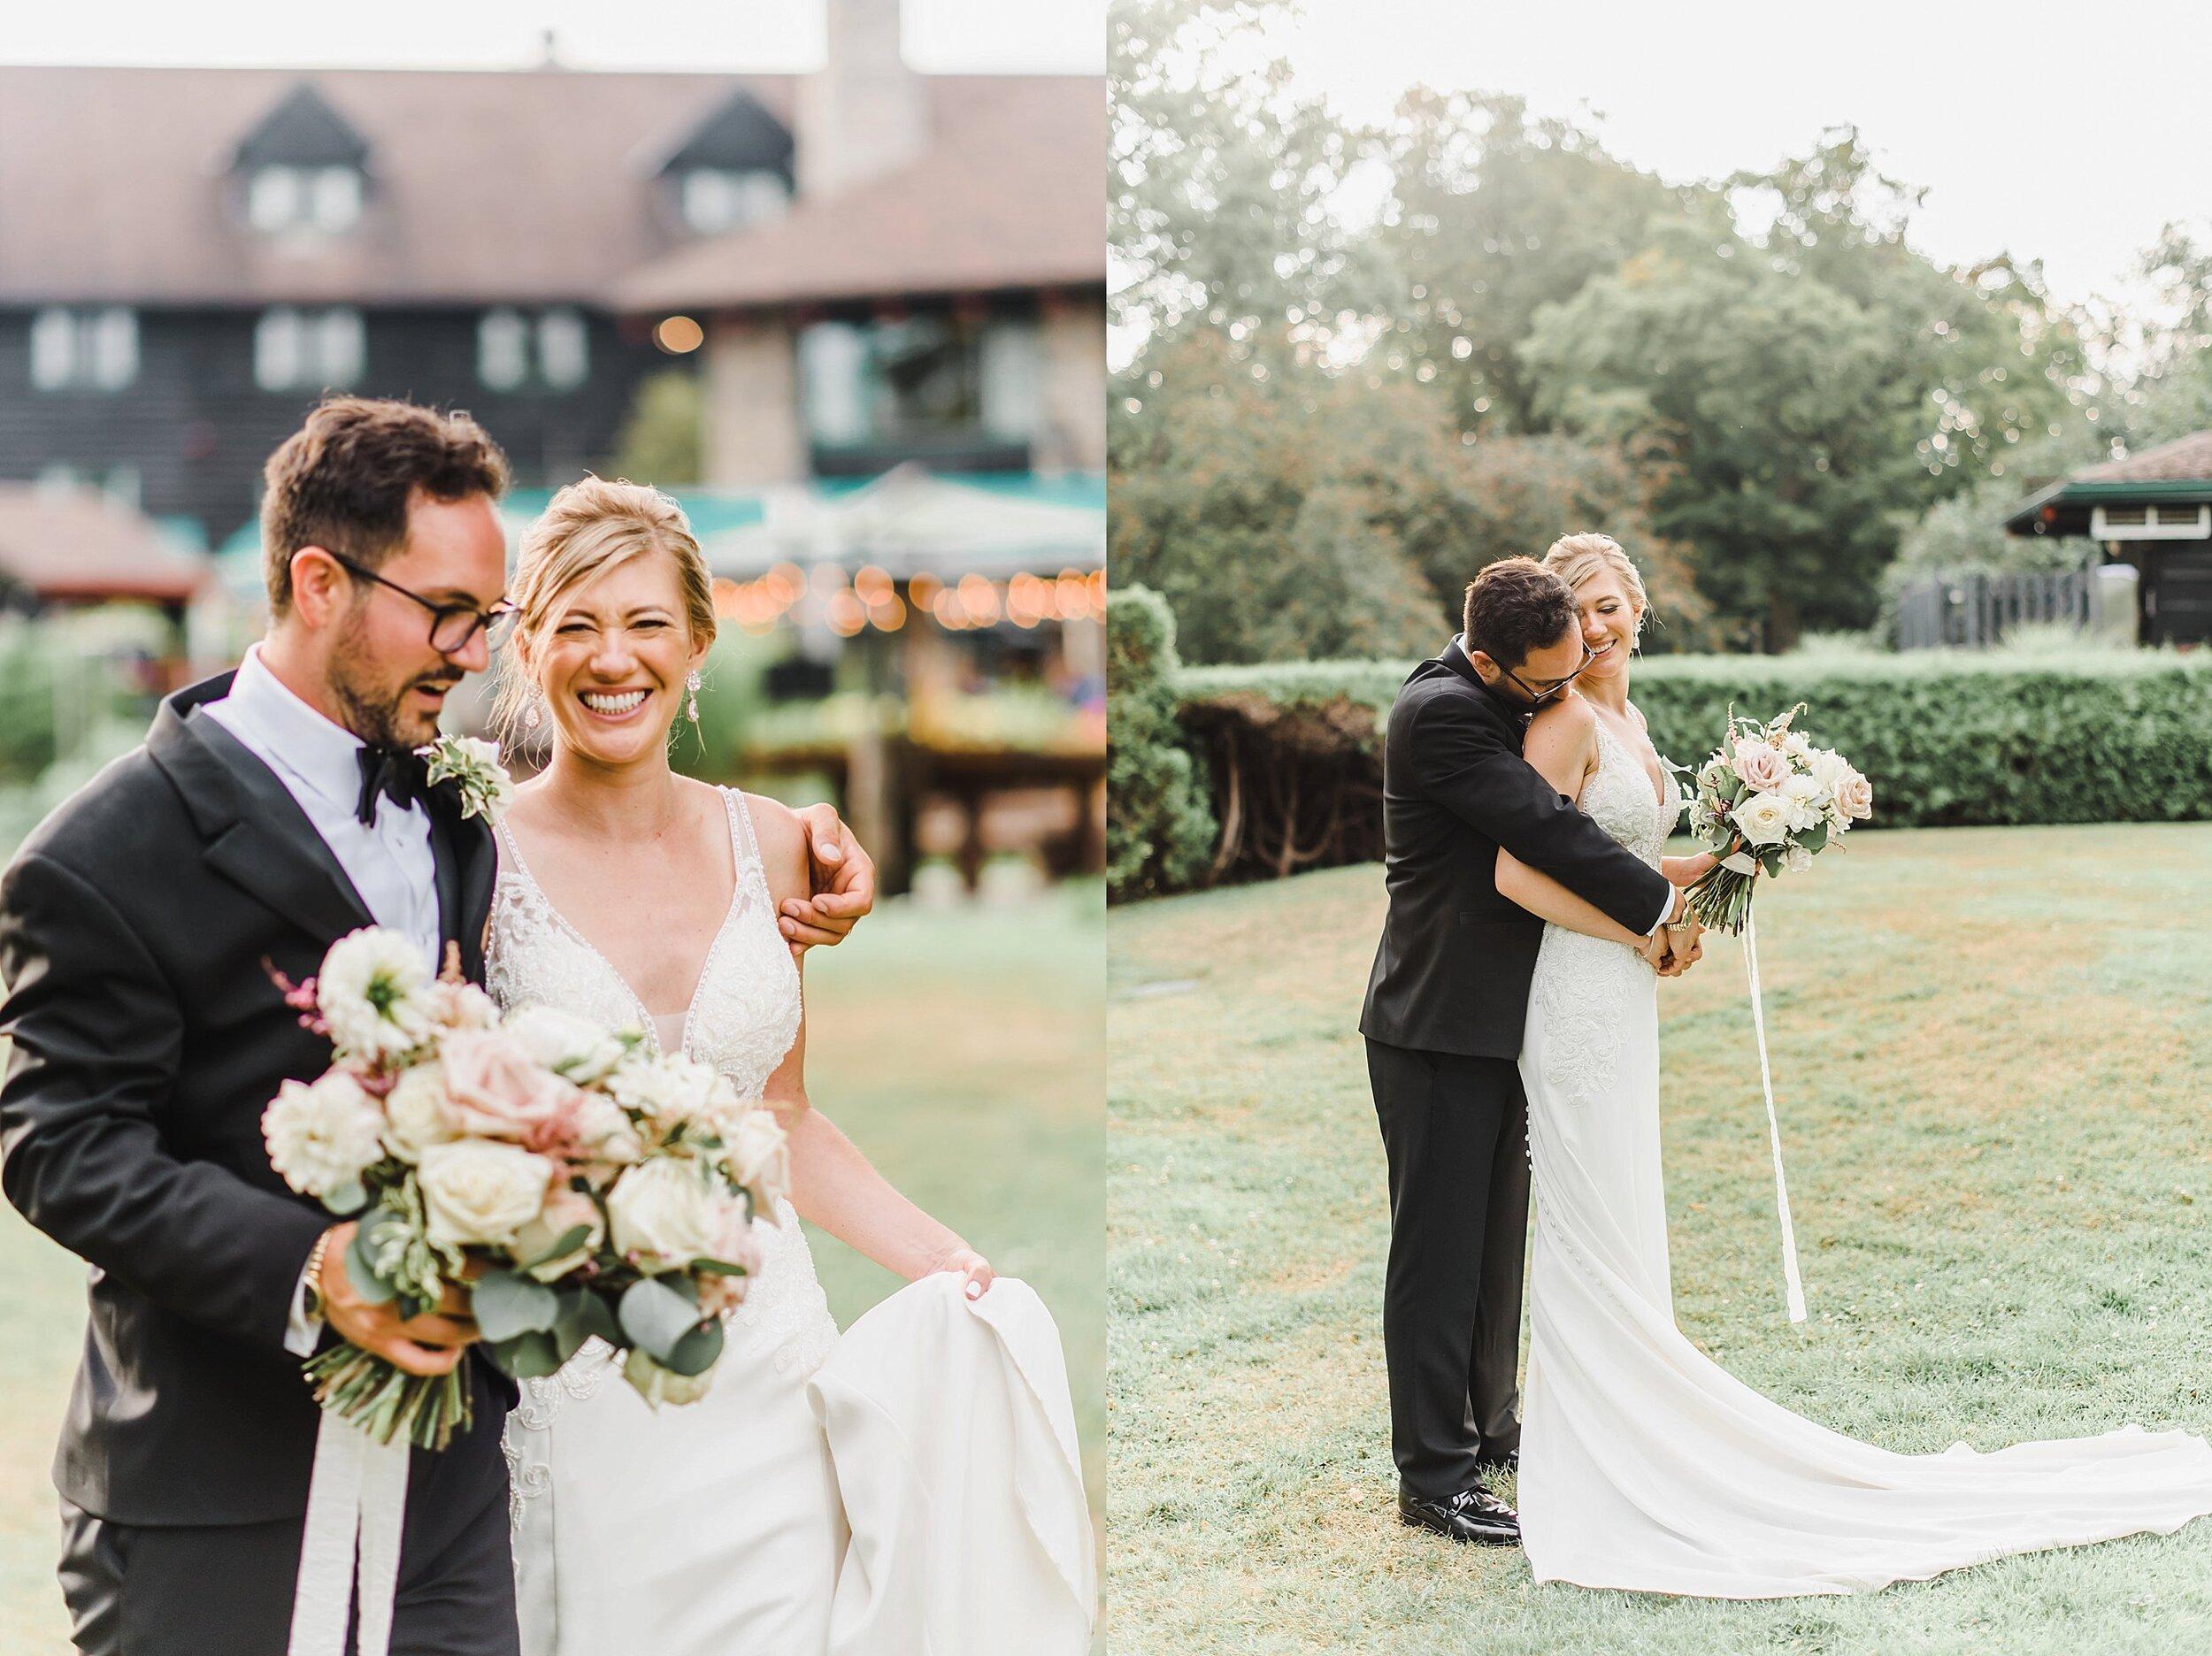 light airy fine art ottawa wedding photographer | Ali and Batoul Photography | Fairmont Le Chateau Montebello63.jpg